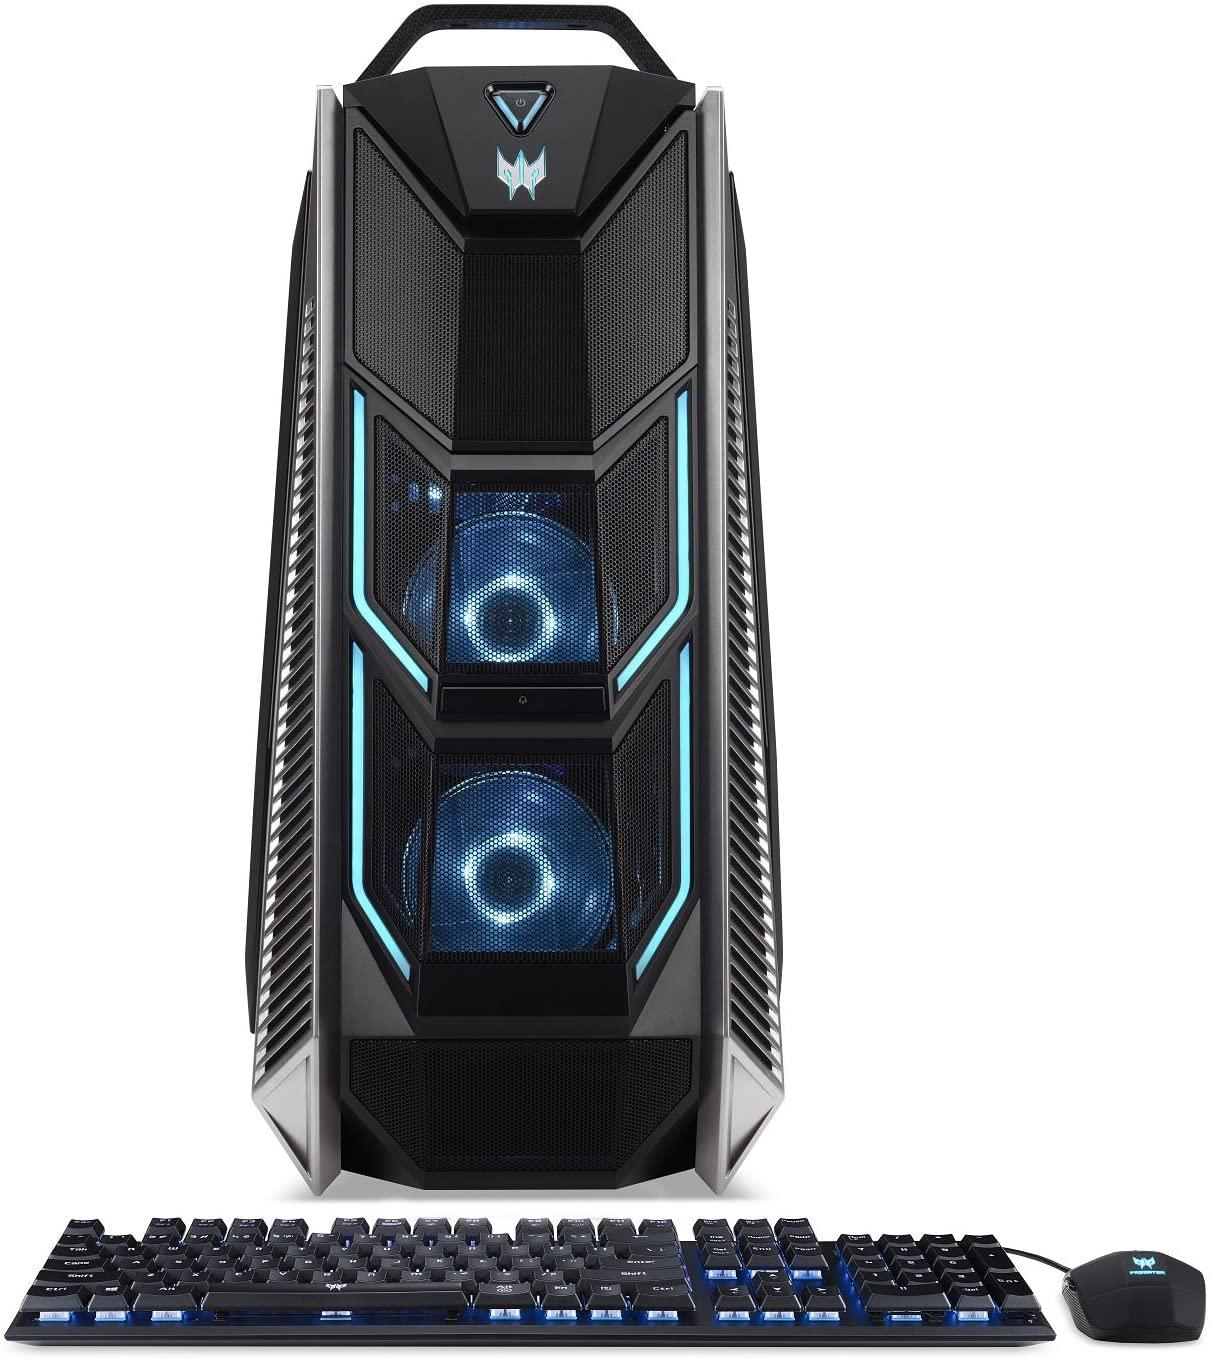 Acer Predator Orion 9000 Gaming Desktop PC